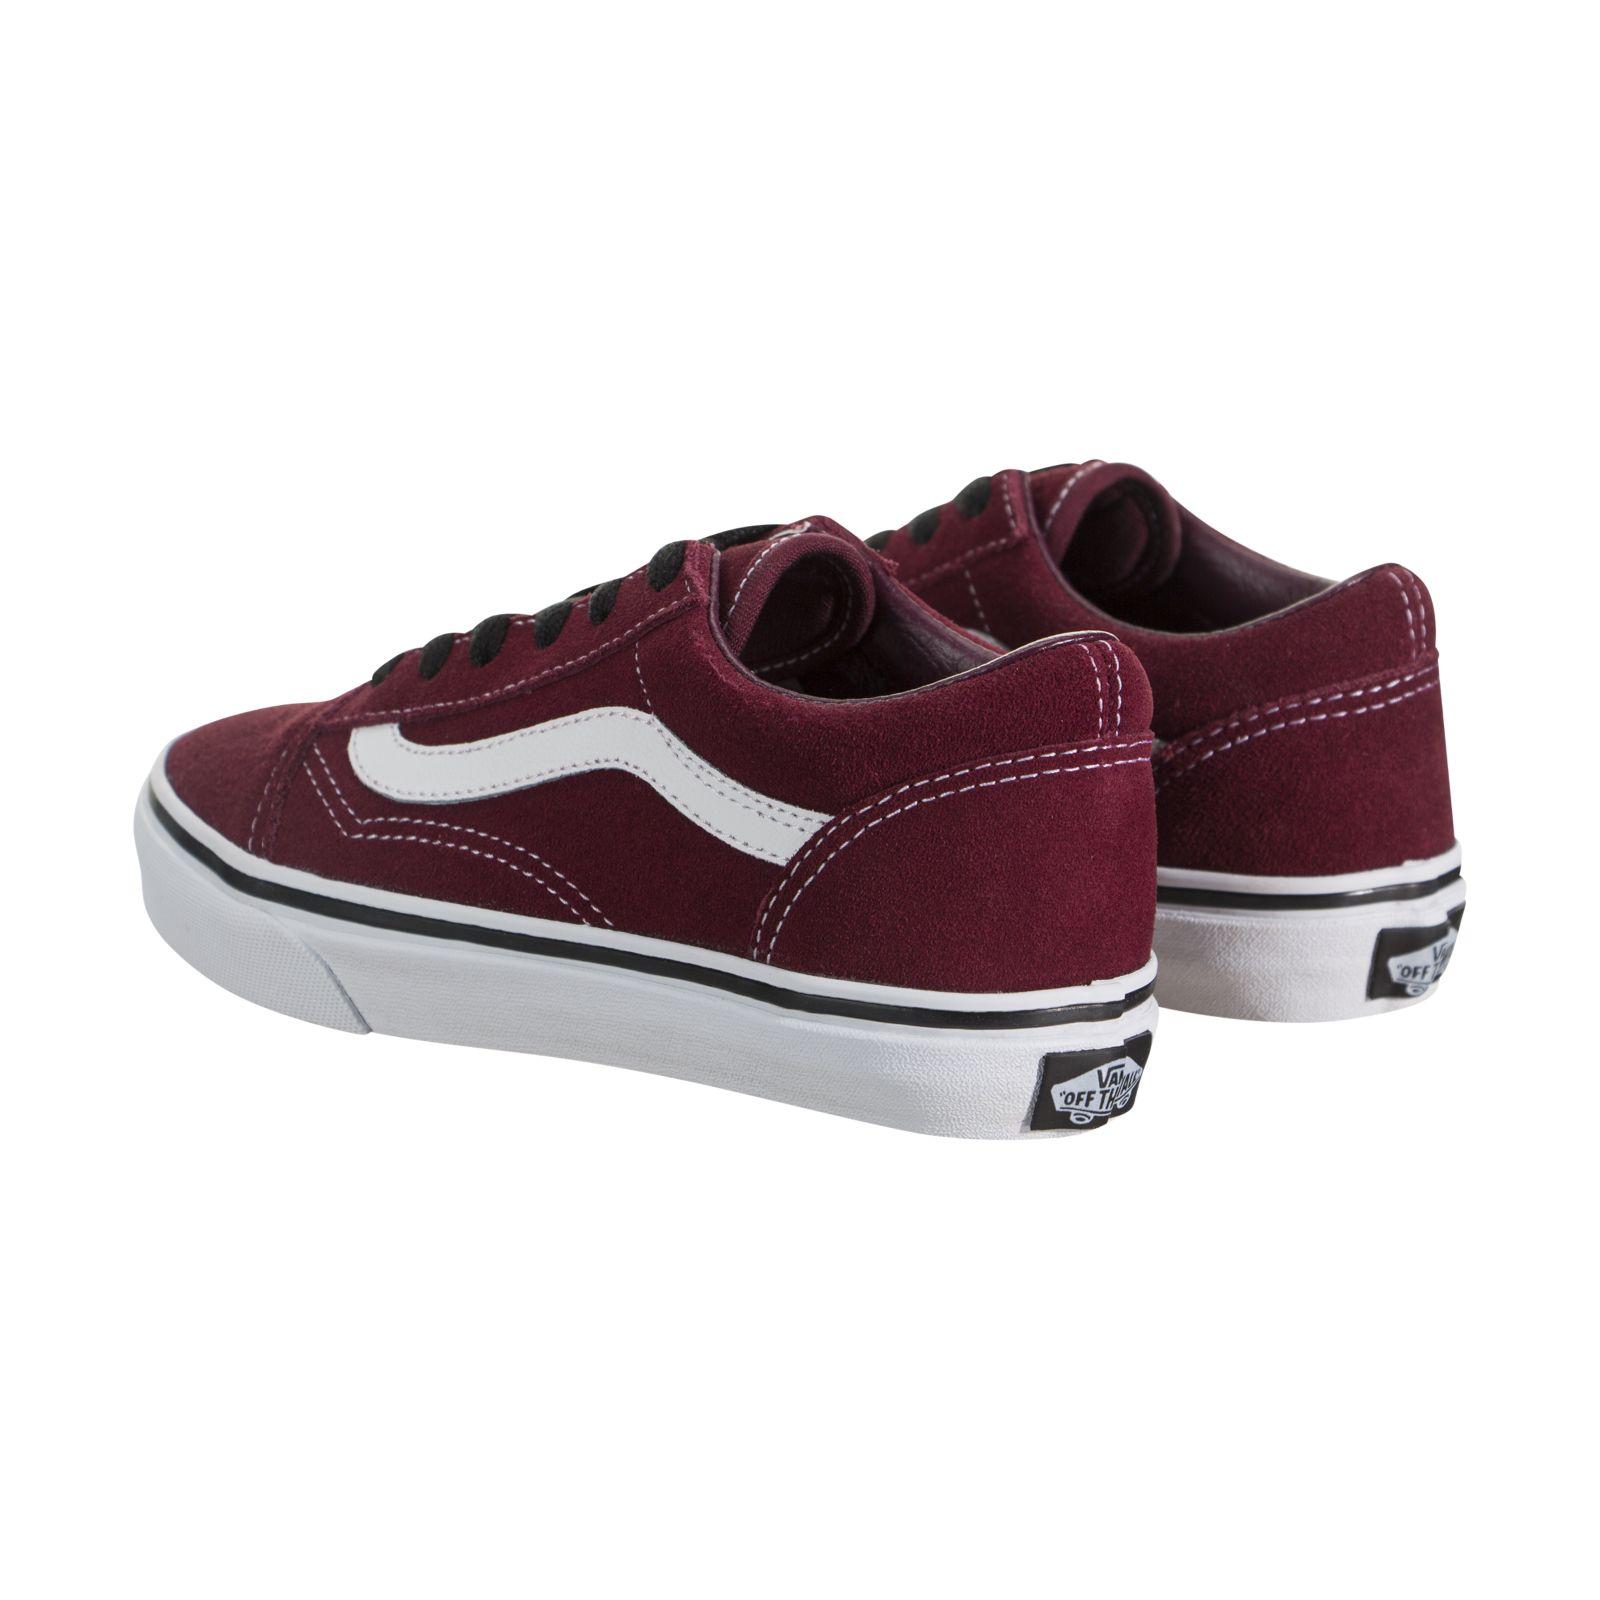 buy online 7e97a d5c10 Vans-Old-Skool-Preschool-vn0a38hb6e0 thumbnail 4